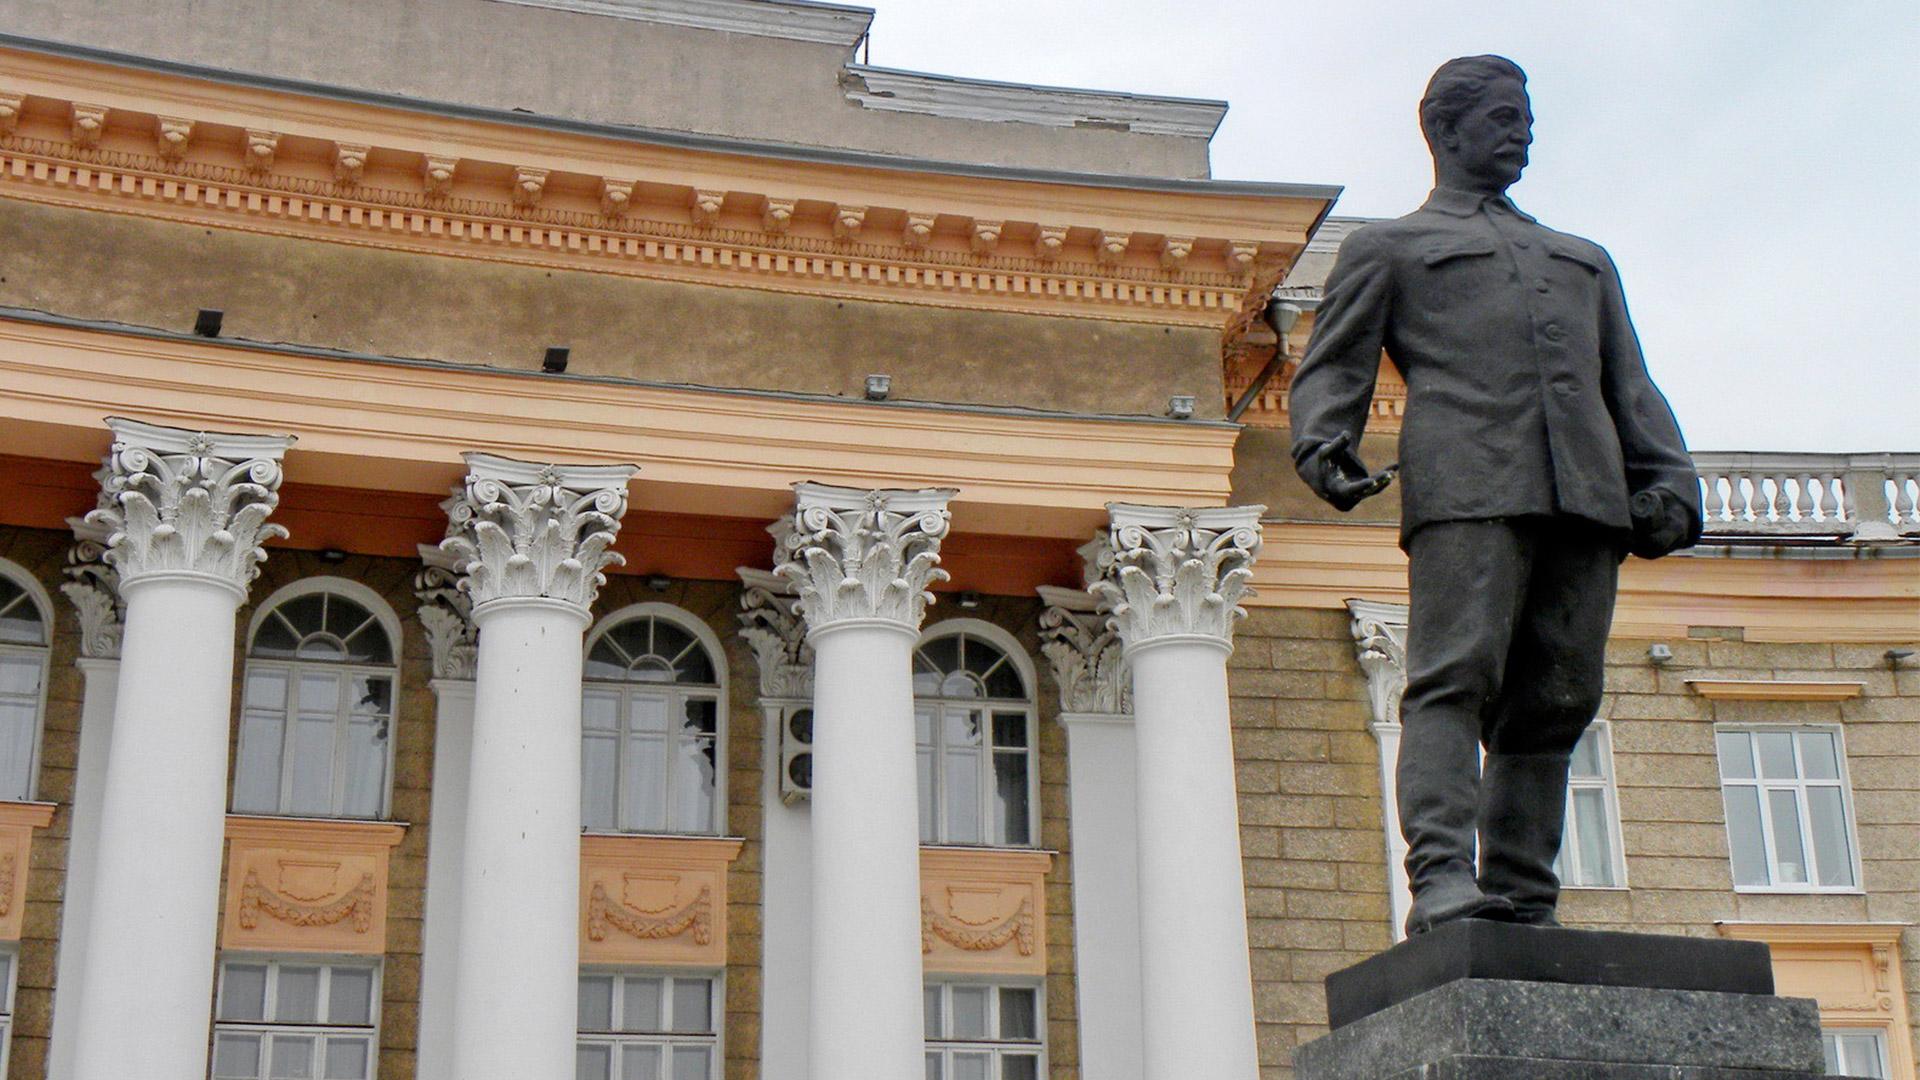 Имя в названии: комиссар юга и тяжпрома Серго Орджоникидзе